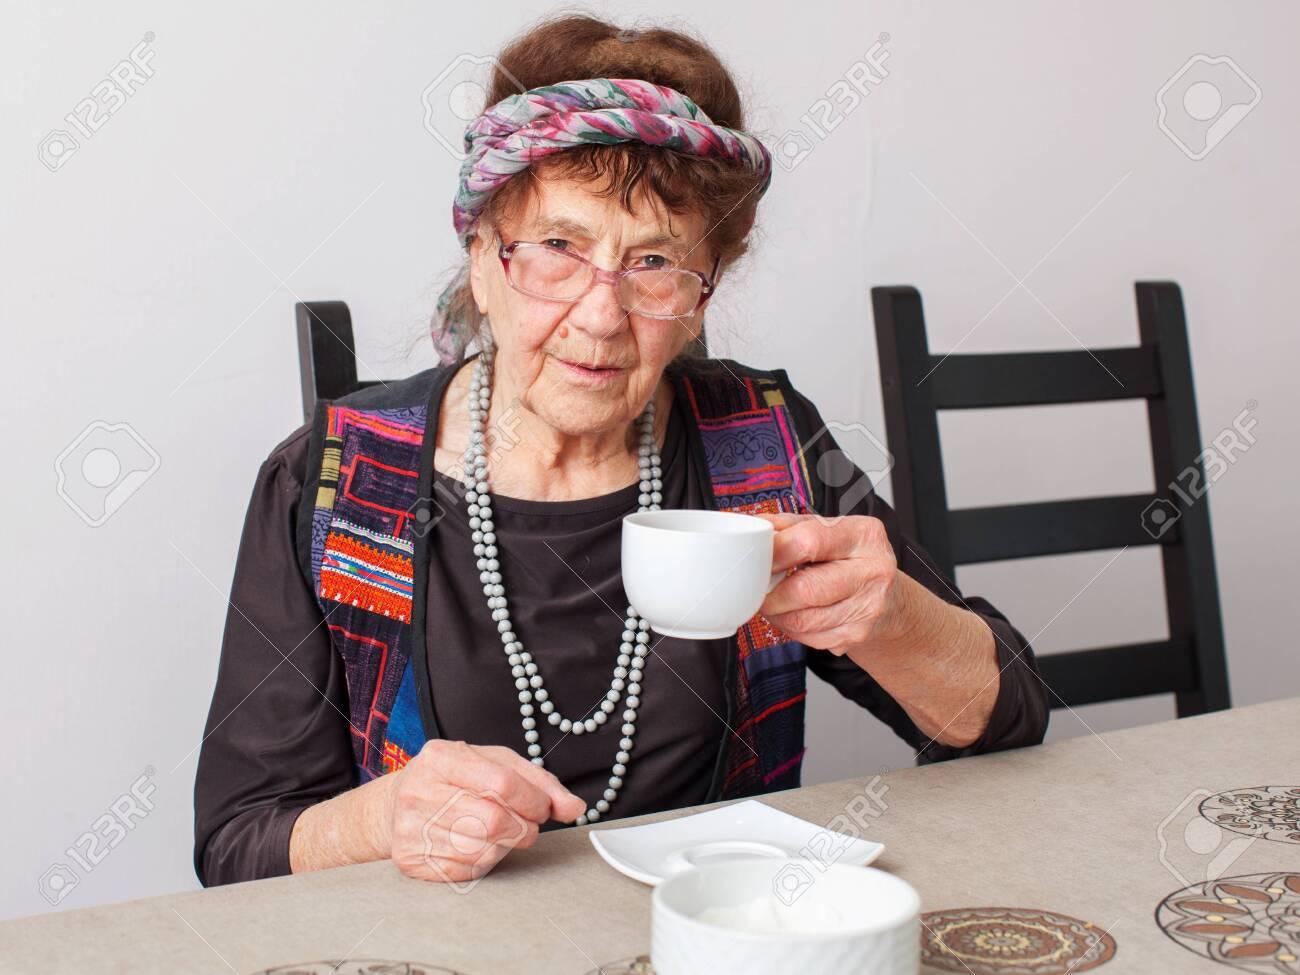 Granny com www mature Granny for